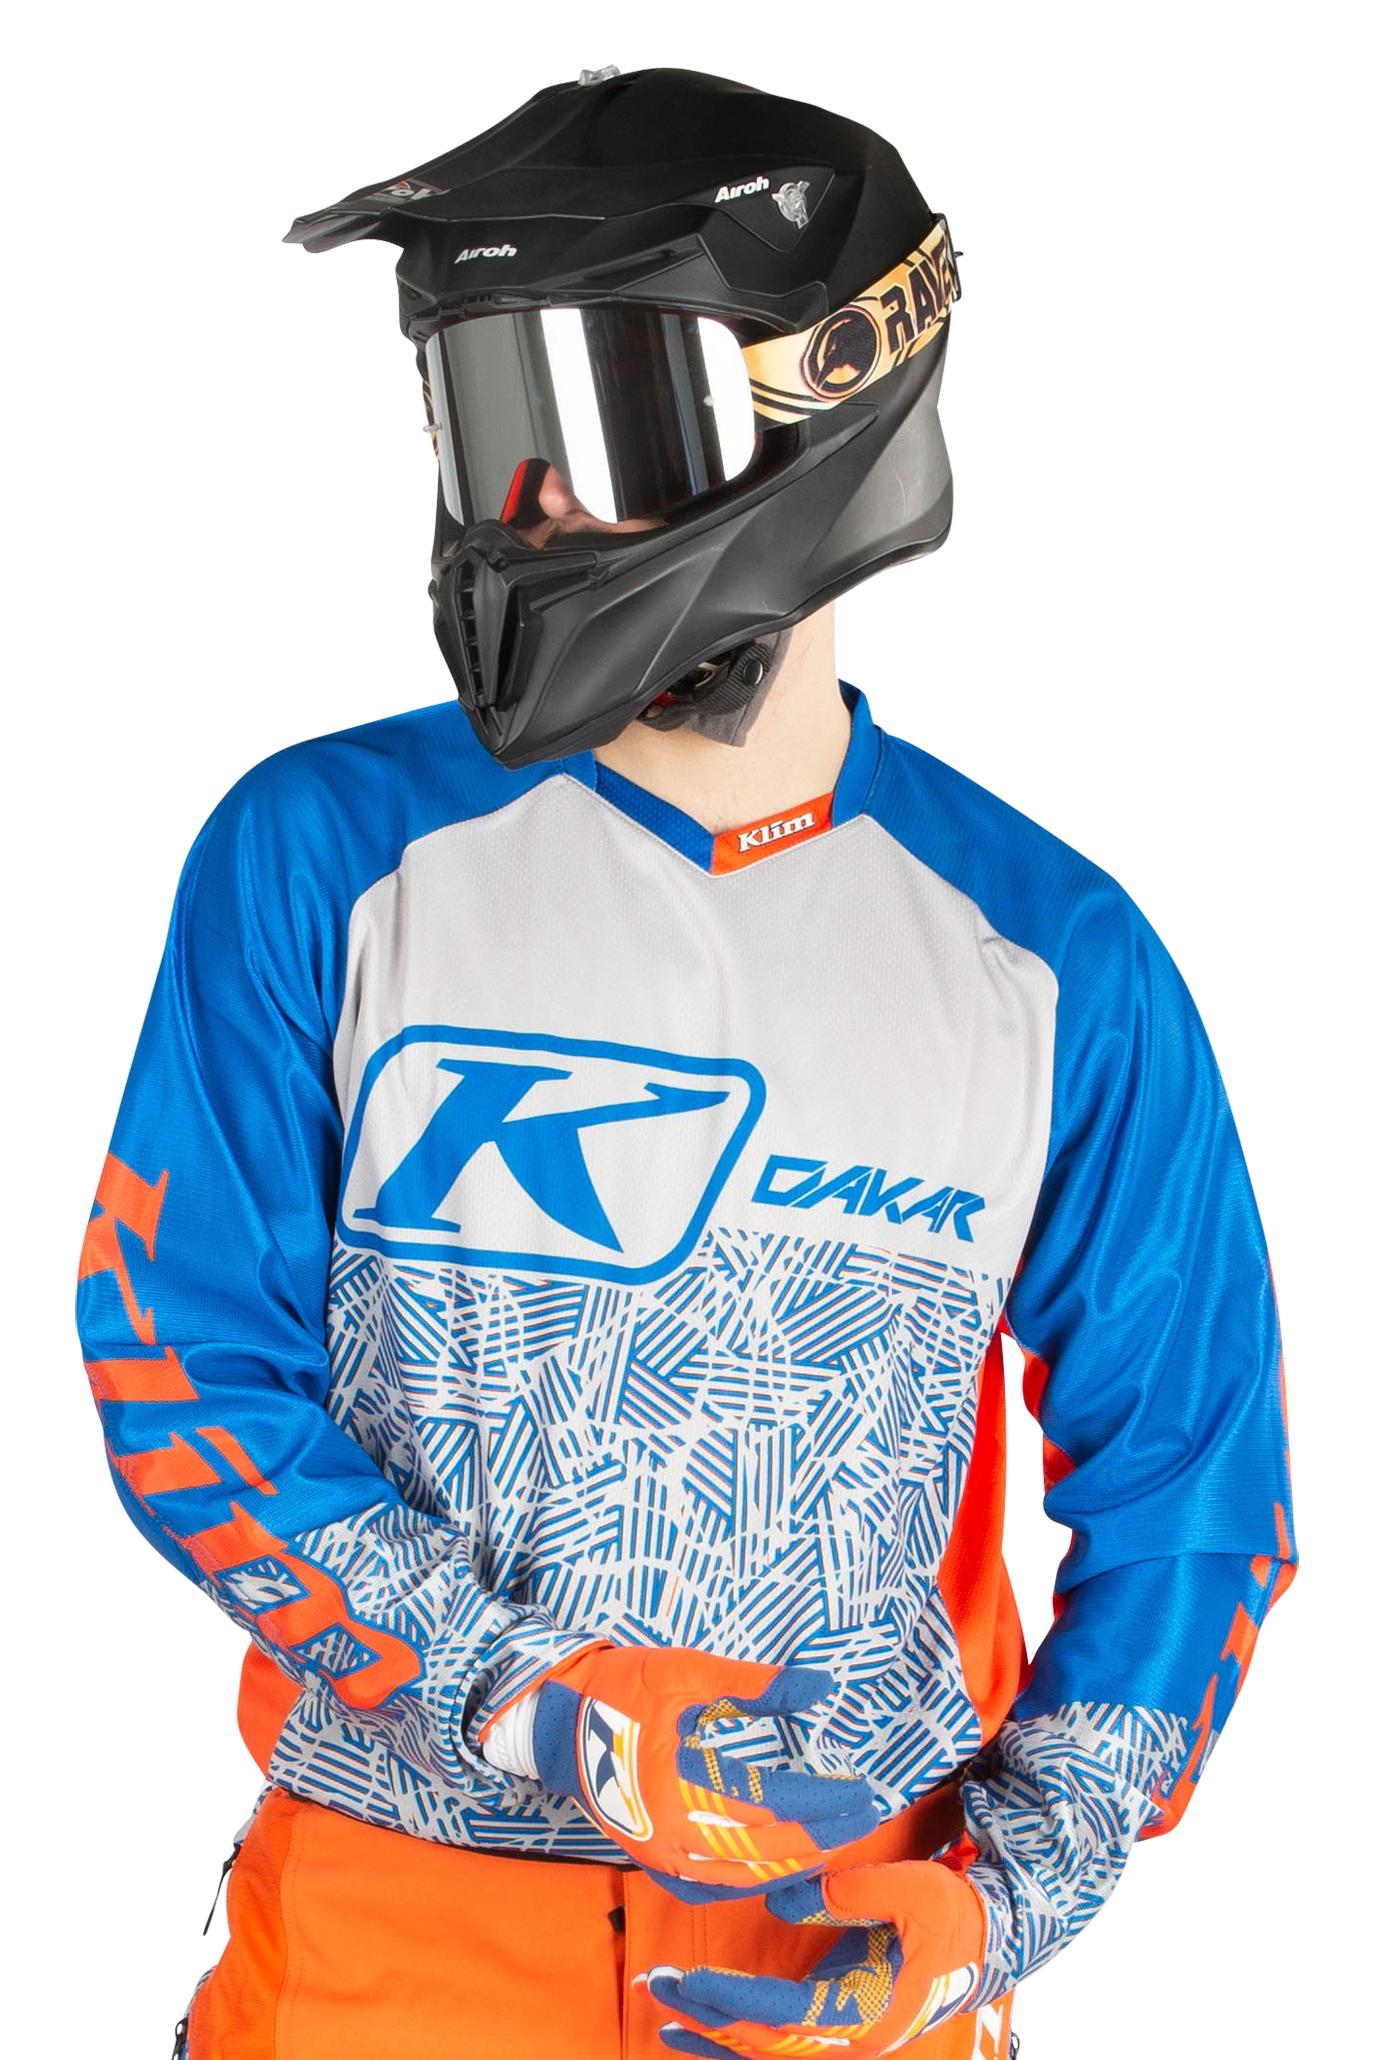 KLIM Maglia Cross  Dakar Arancio-Blu